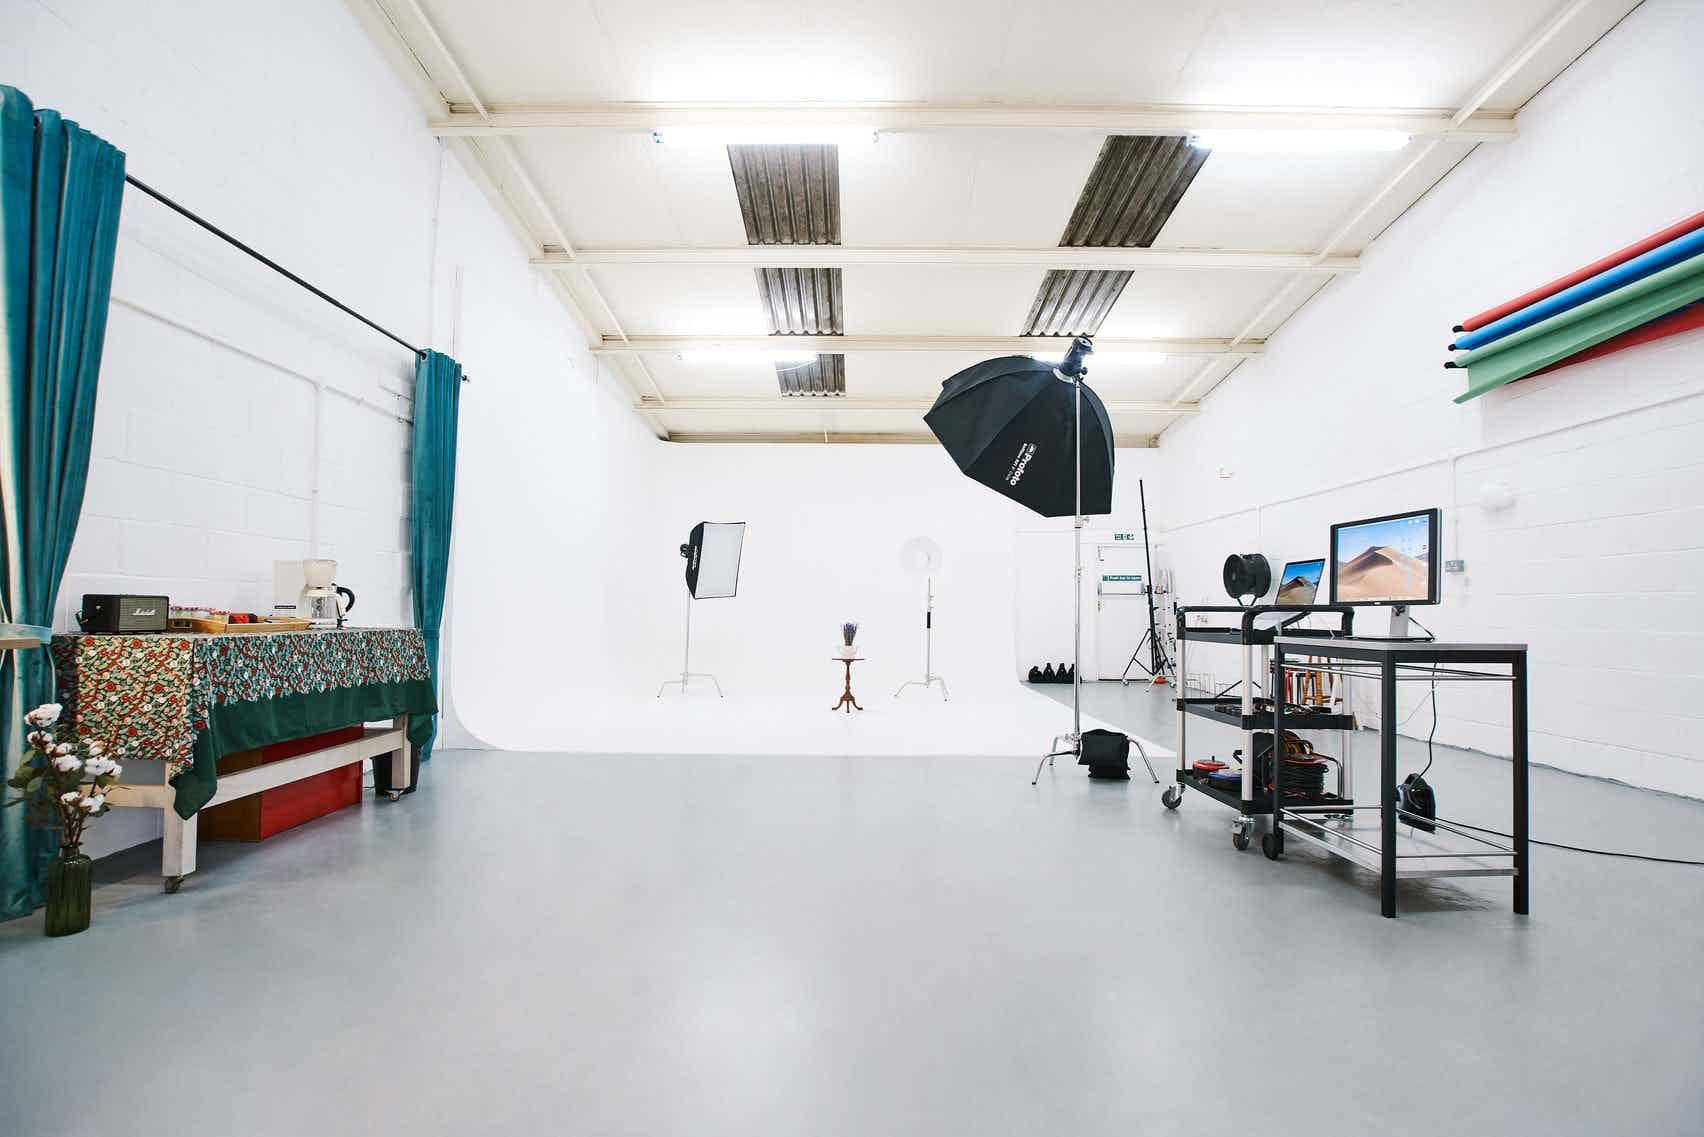 Photography and film studio, CB Studio Space